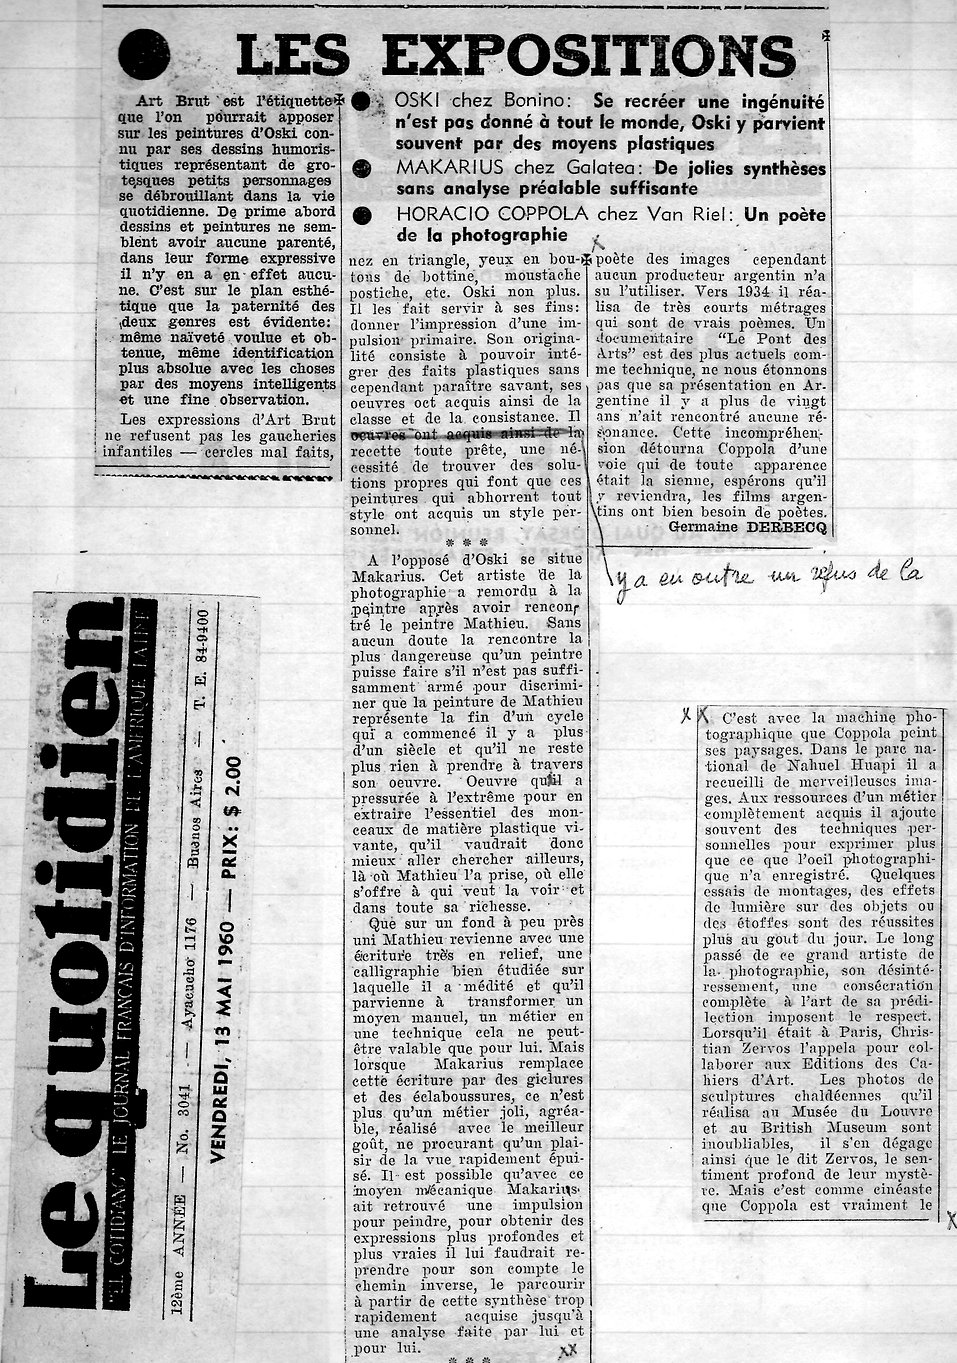 Le Quotidien2 - Oski chez Bonino y Makar